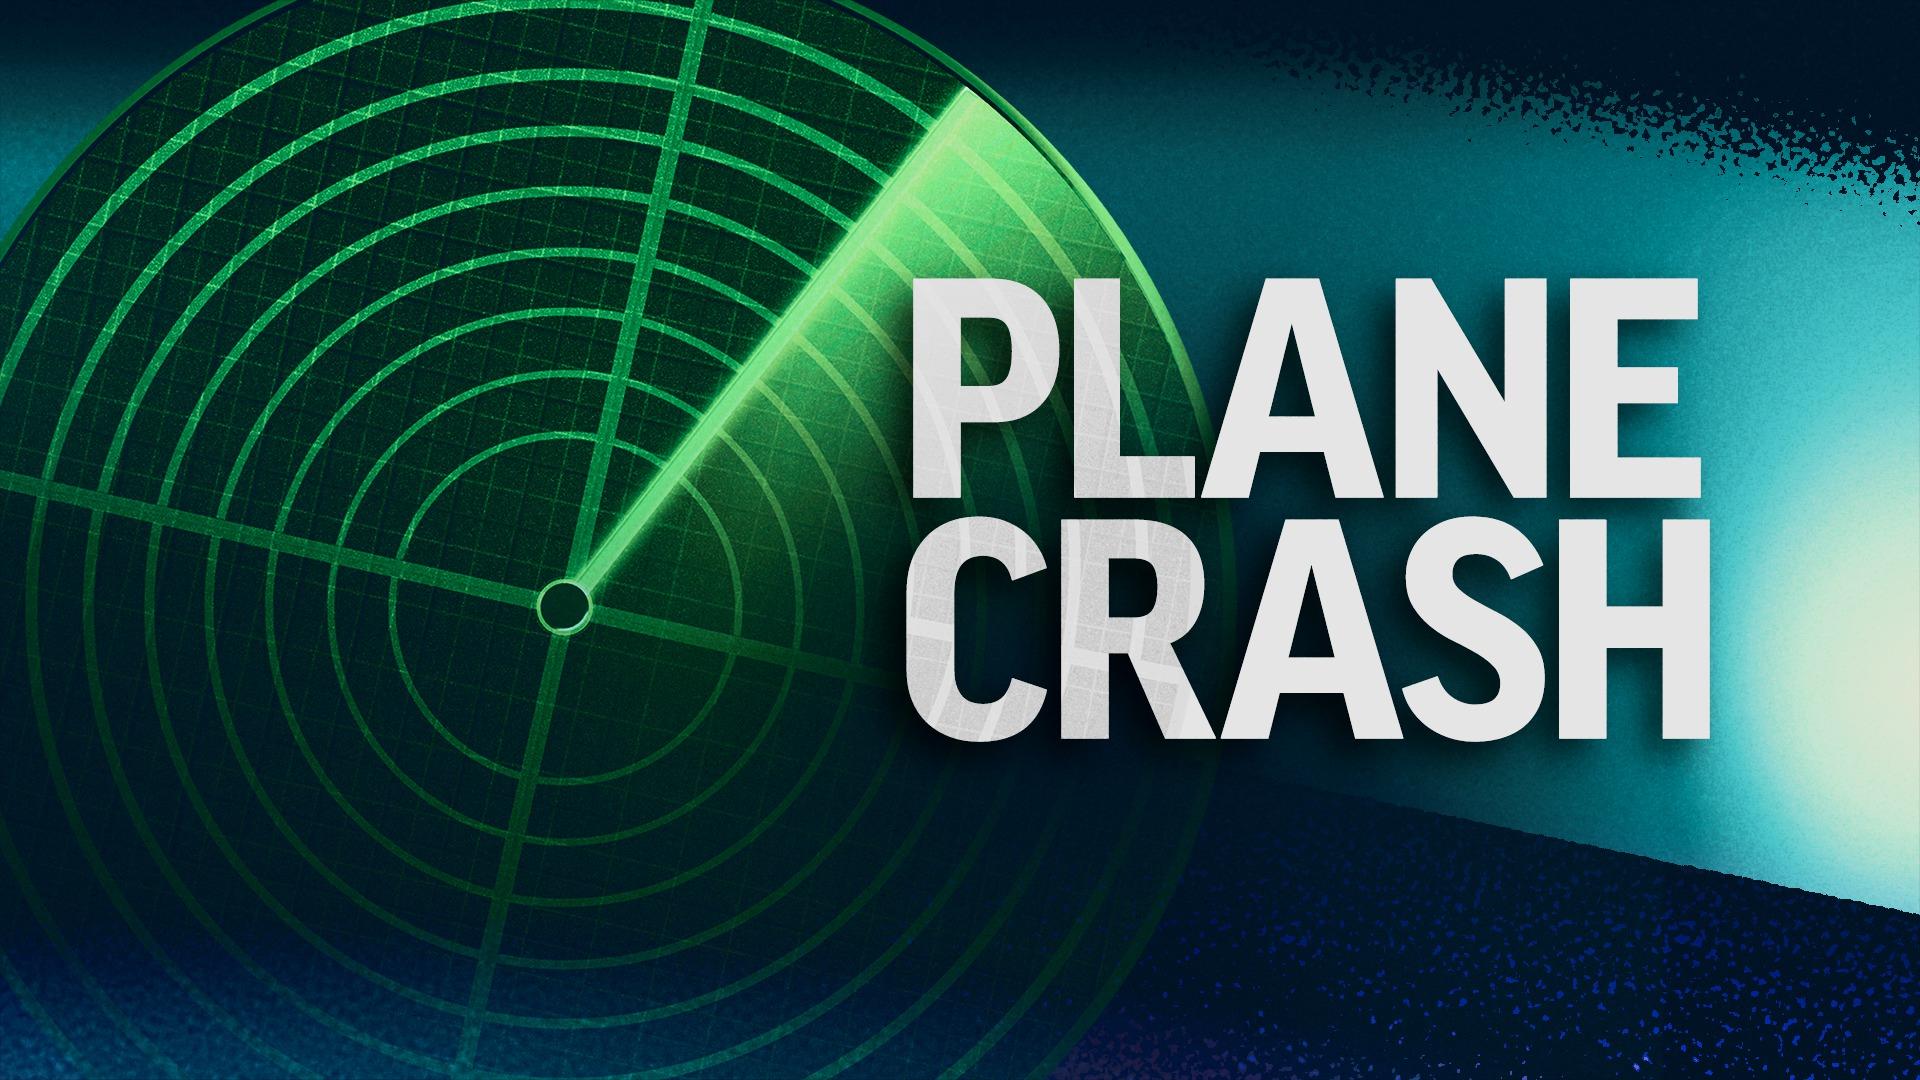 Plane crash_362521